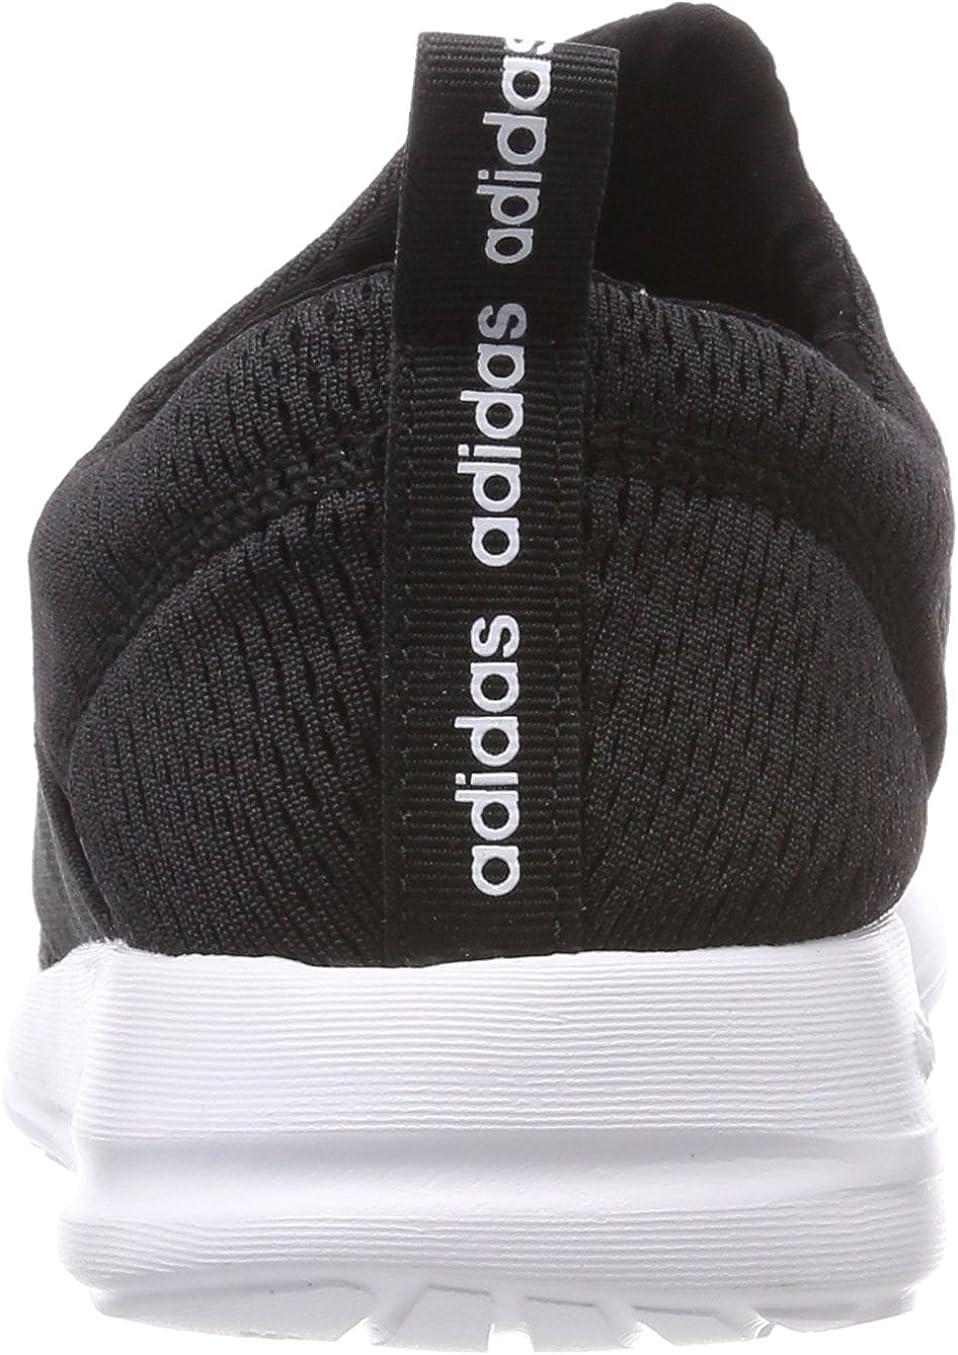 adidas Refine Adapt, Chaussures de Running Femme Noir (Negbas/Carbon/Ftwbla 000)